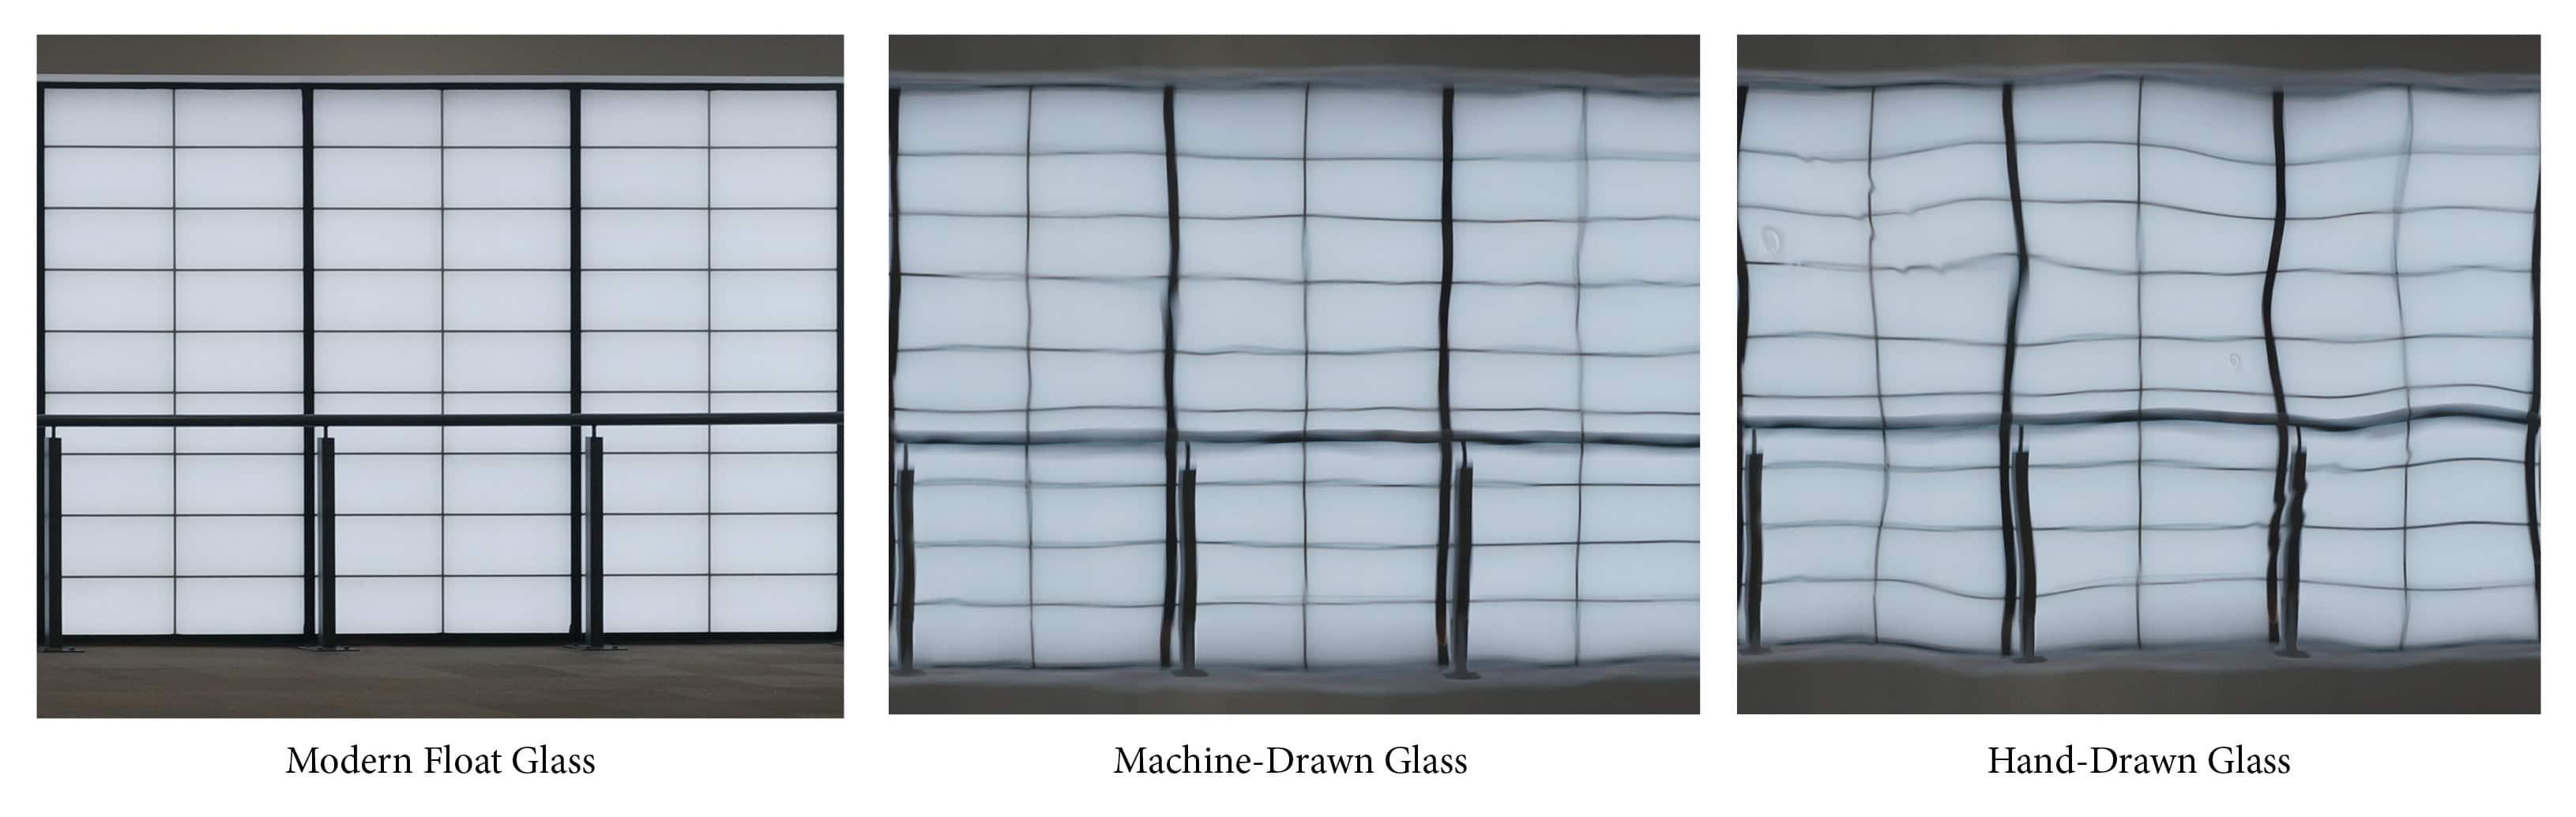 Glazing options - float glass, machine-drawn and hand-drawn glass